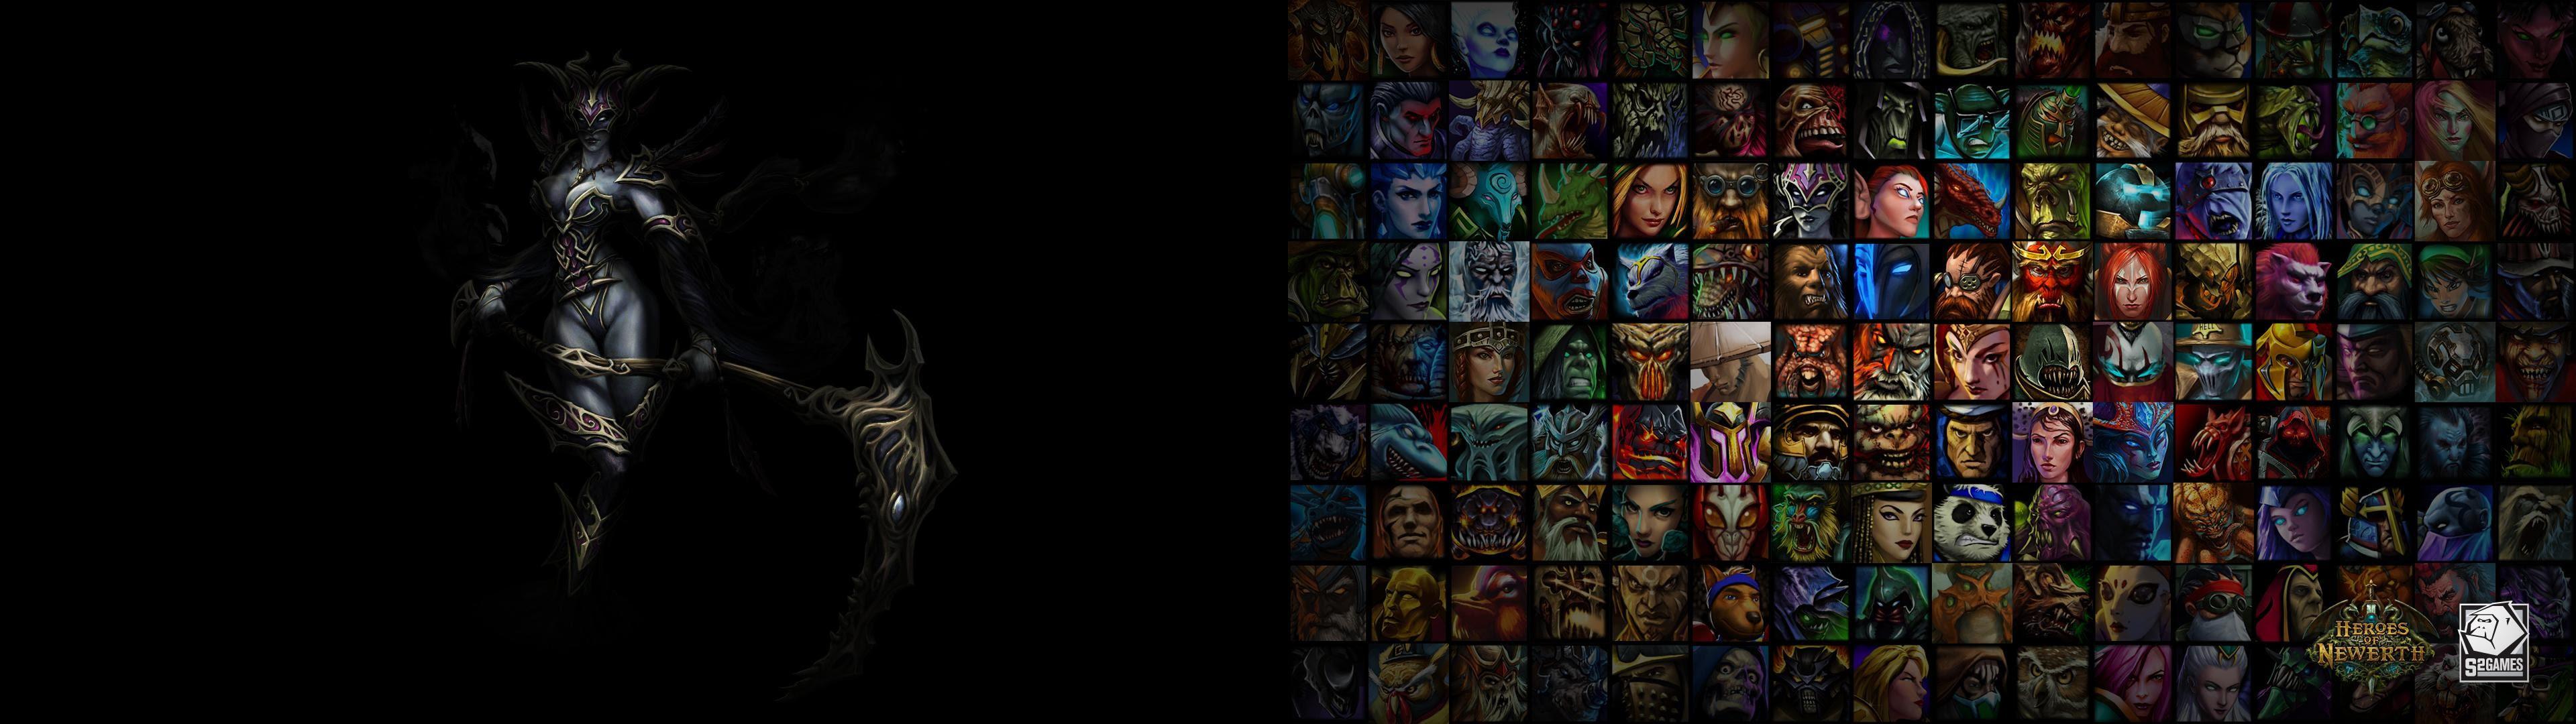 Dual Monitor 1080p Wallpaper 43 Images